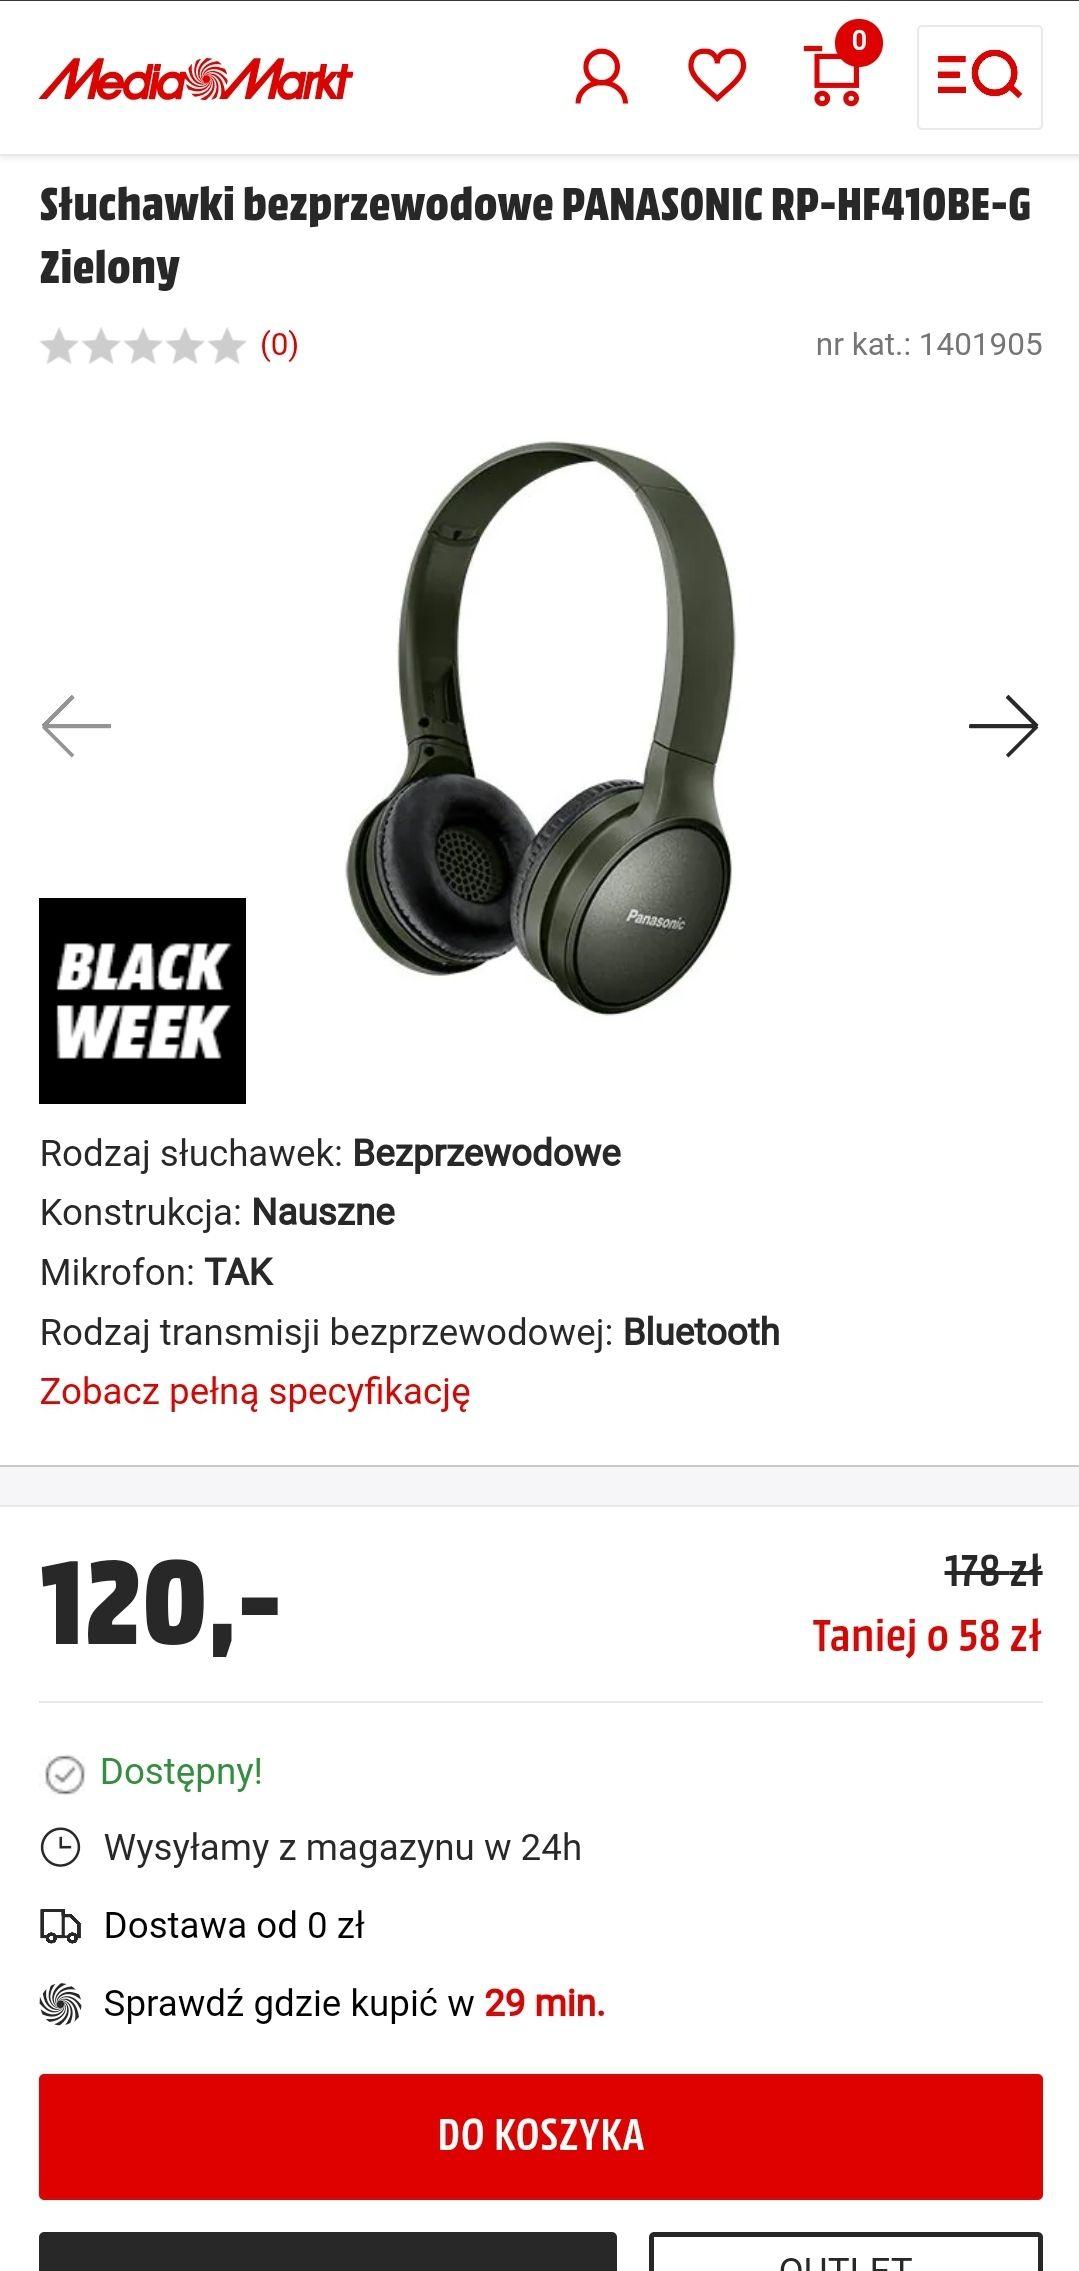 RP-HF410BE-G Słuchawki bezprzewodowe PANASONIC